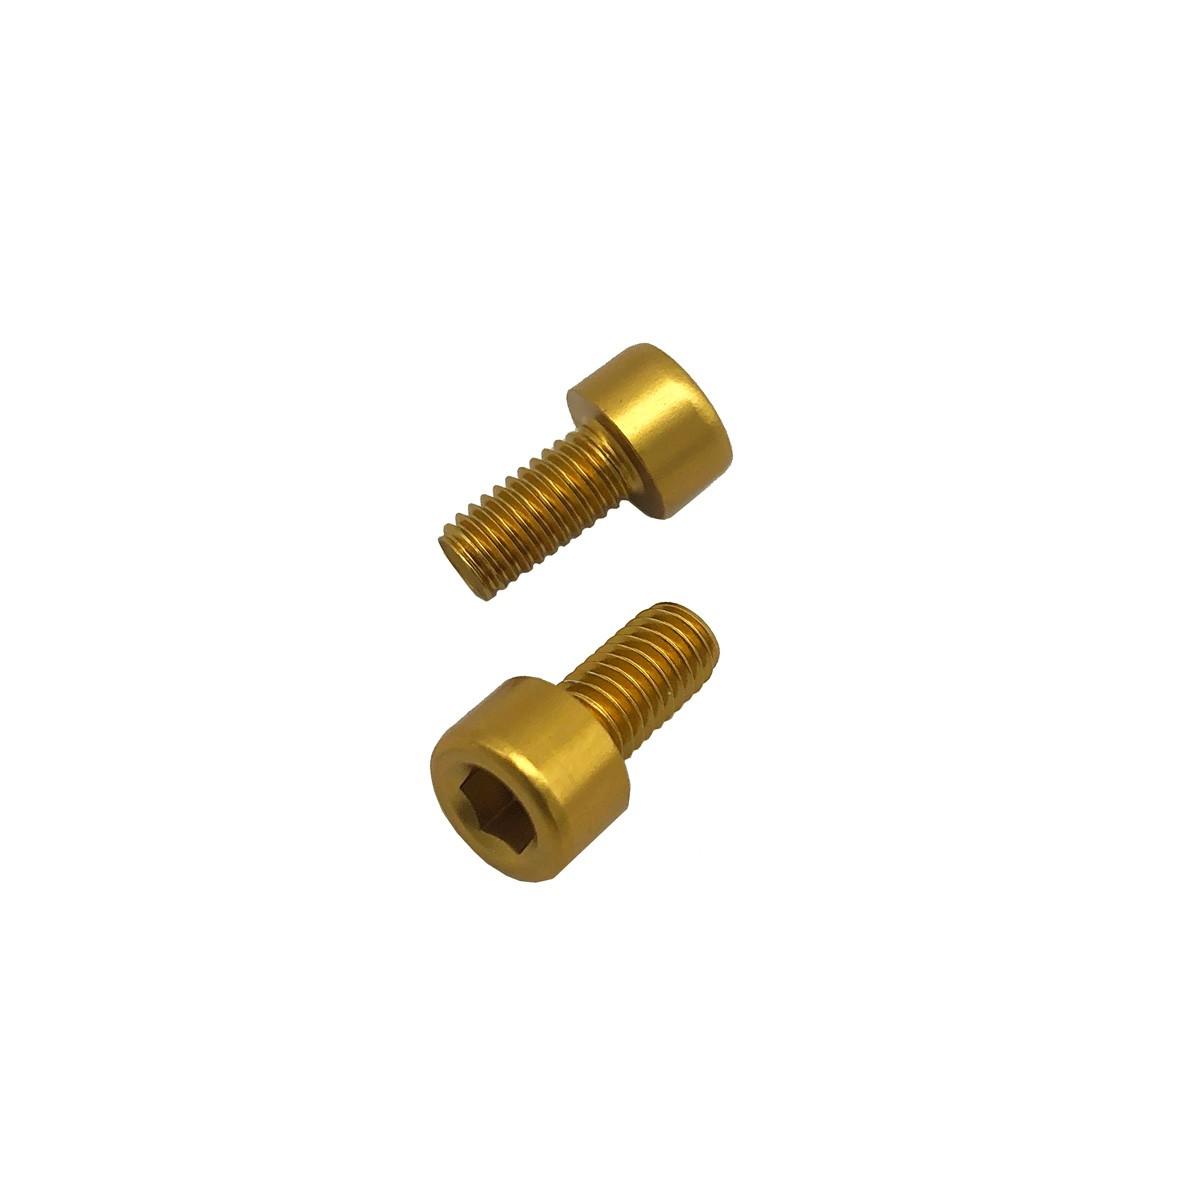 Parafuso Allen de Aluminio Socket Cap M5 x 8mm Dourado